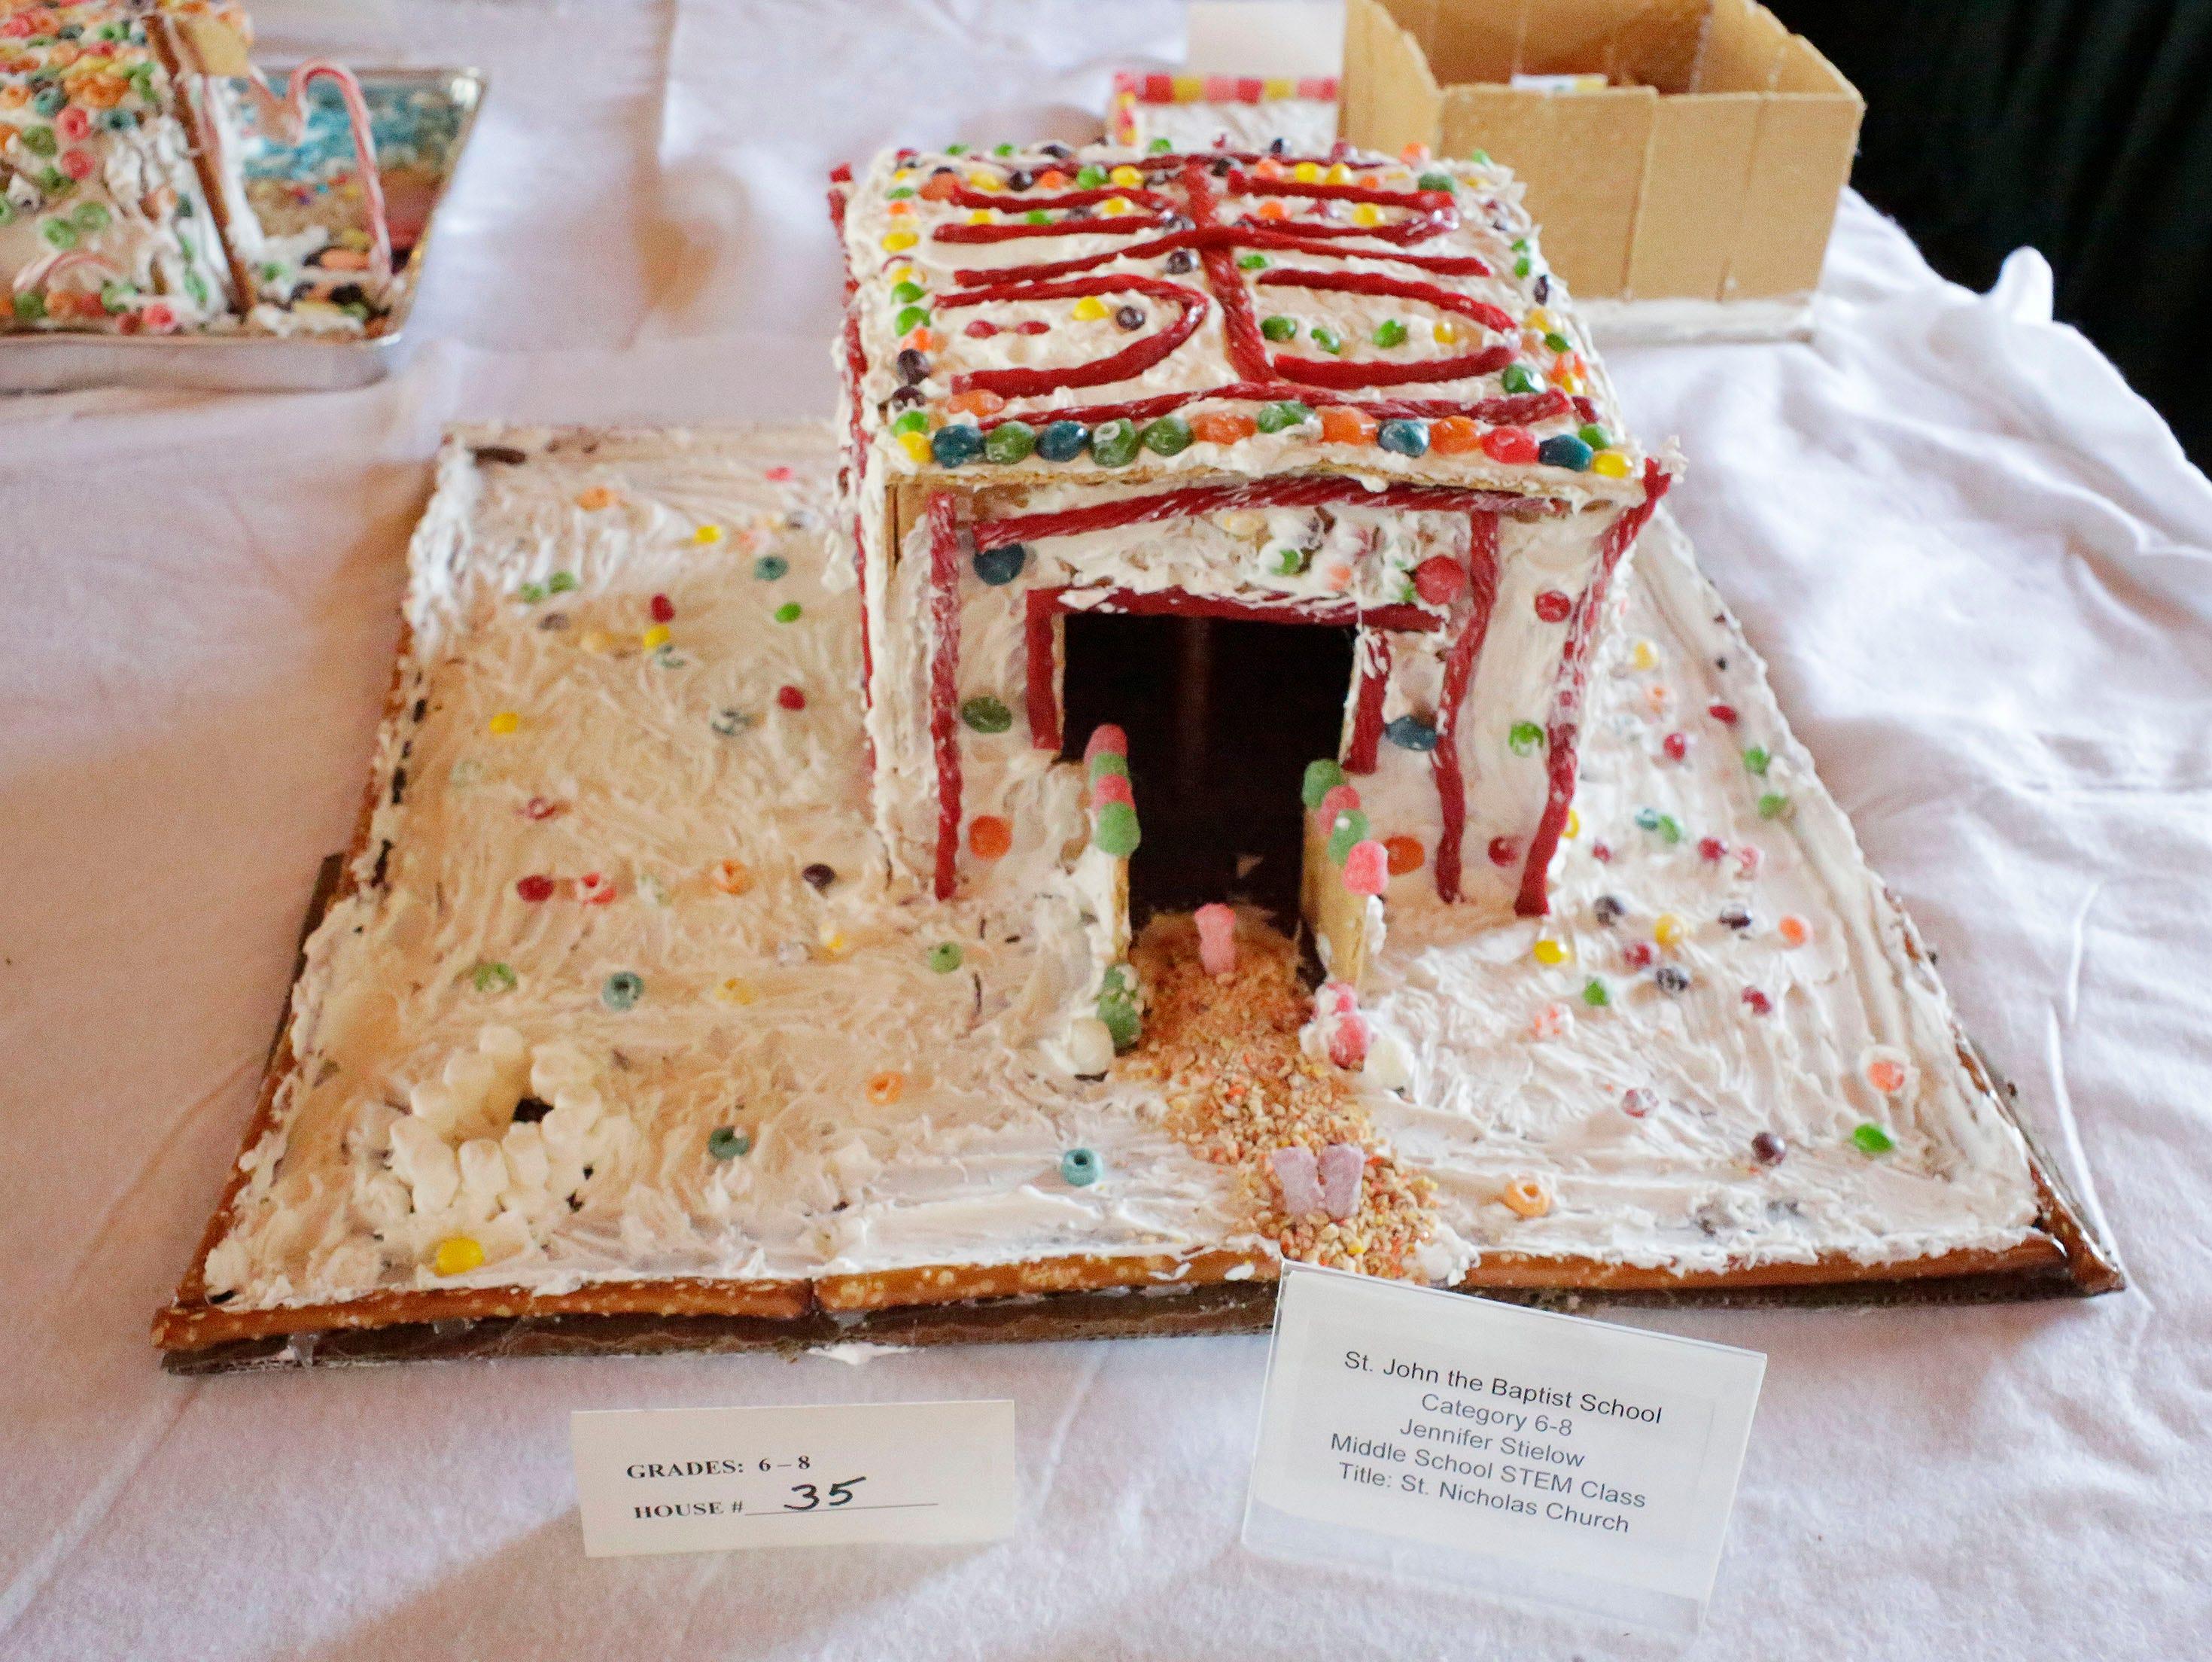 St. Nicholas Church at the annual Waelderhaus Gingerbread Festival, Saturday, December 8, 2018, in Kohler, Wis.